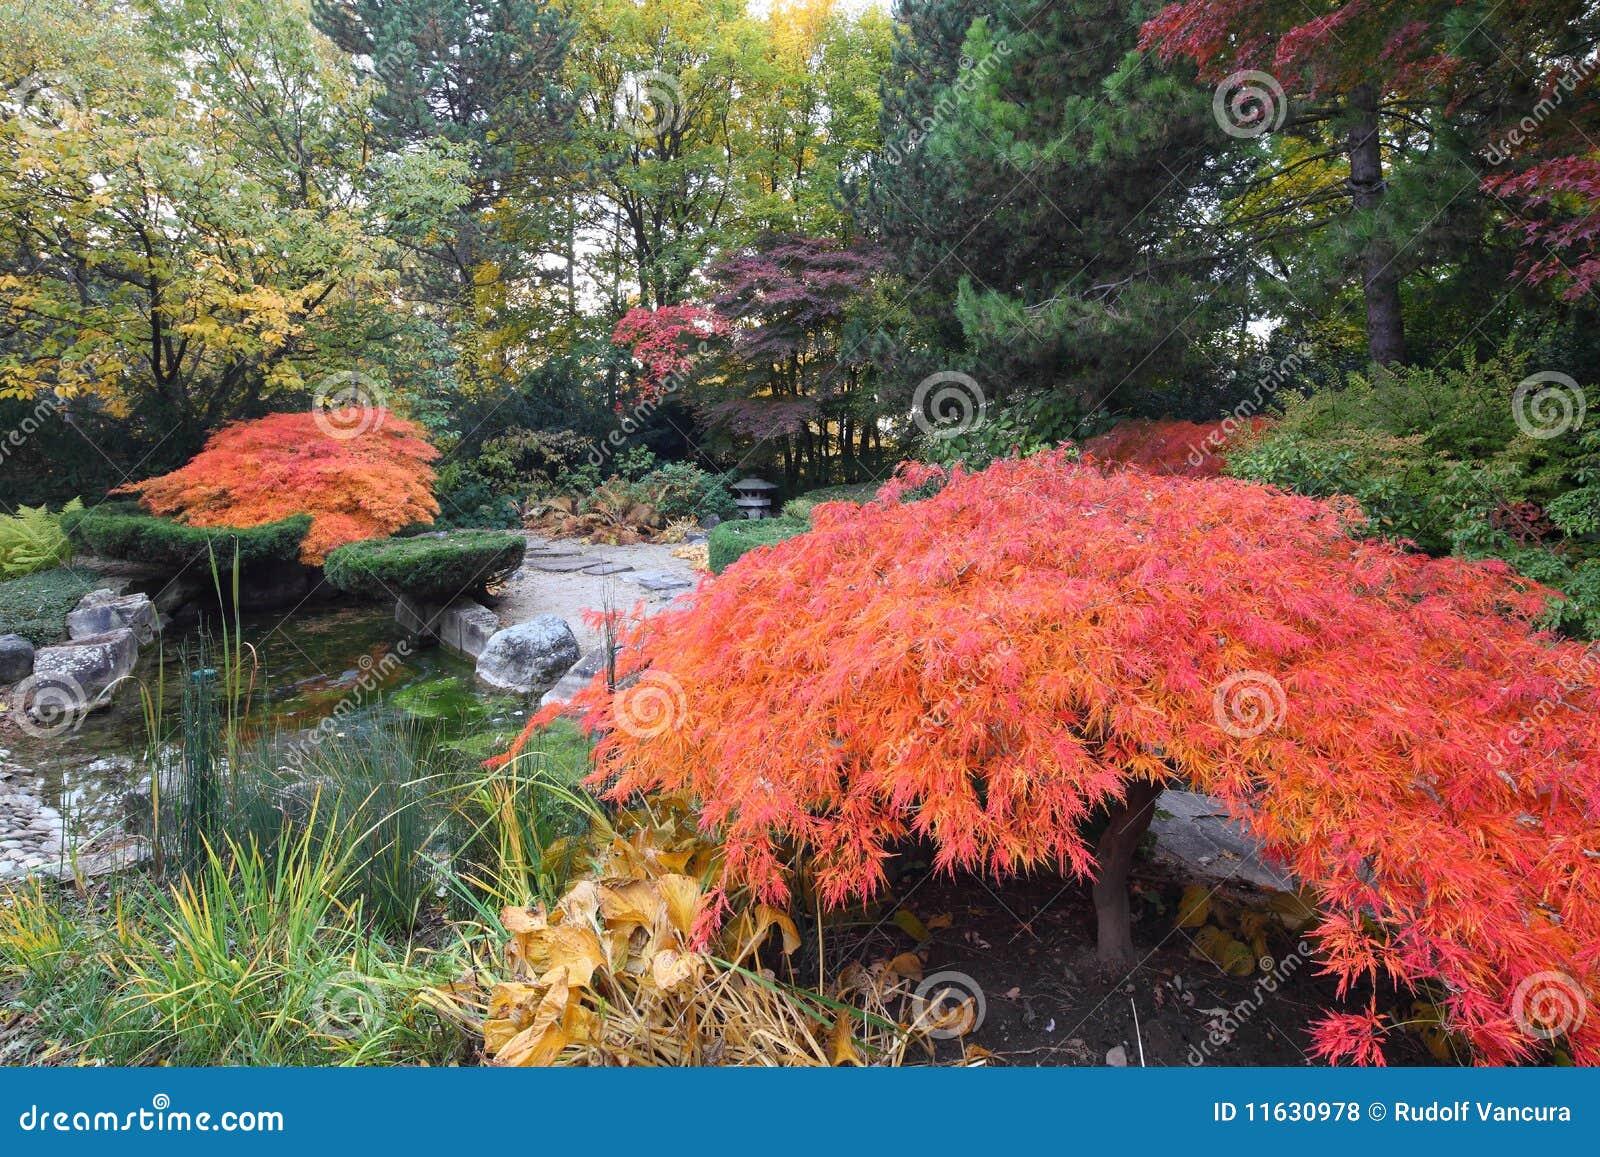 Maple trees in japanese garden royalty free stock photos for Japanese garden trees